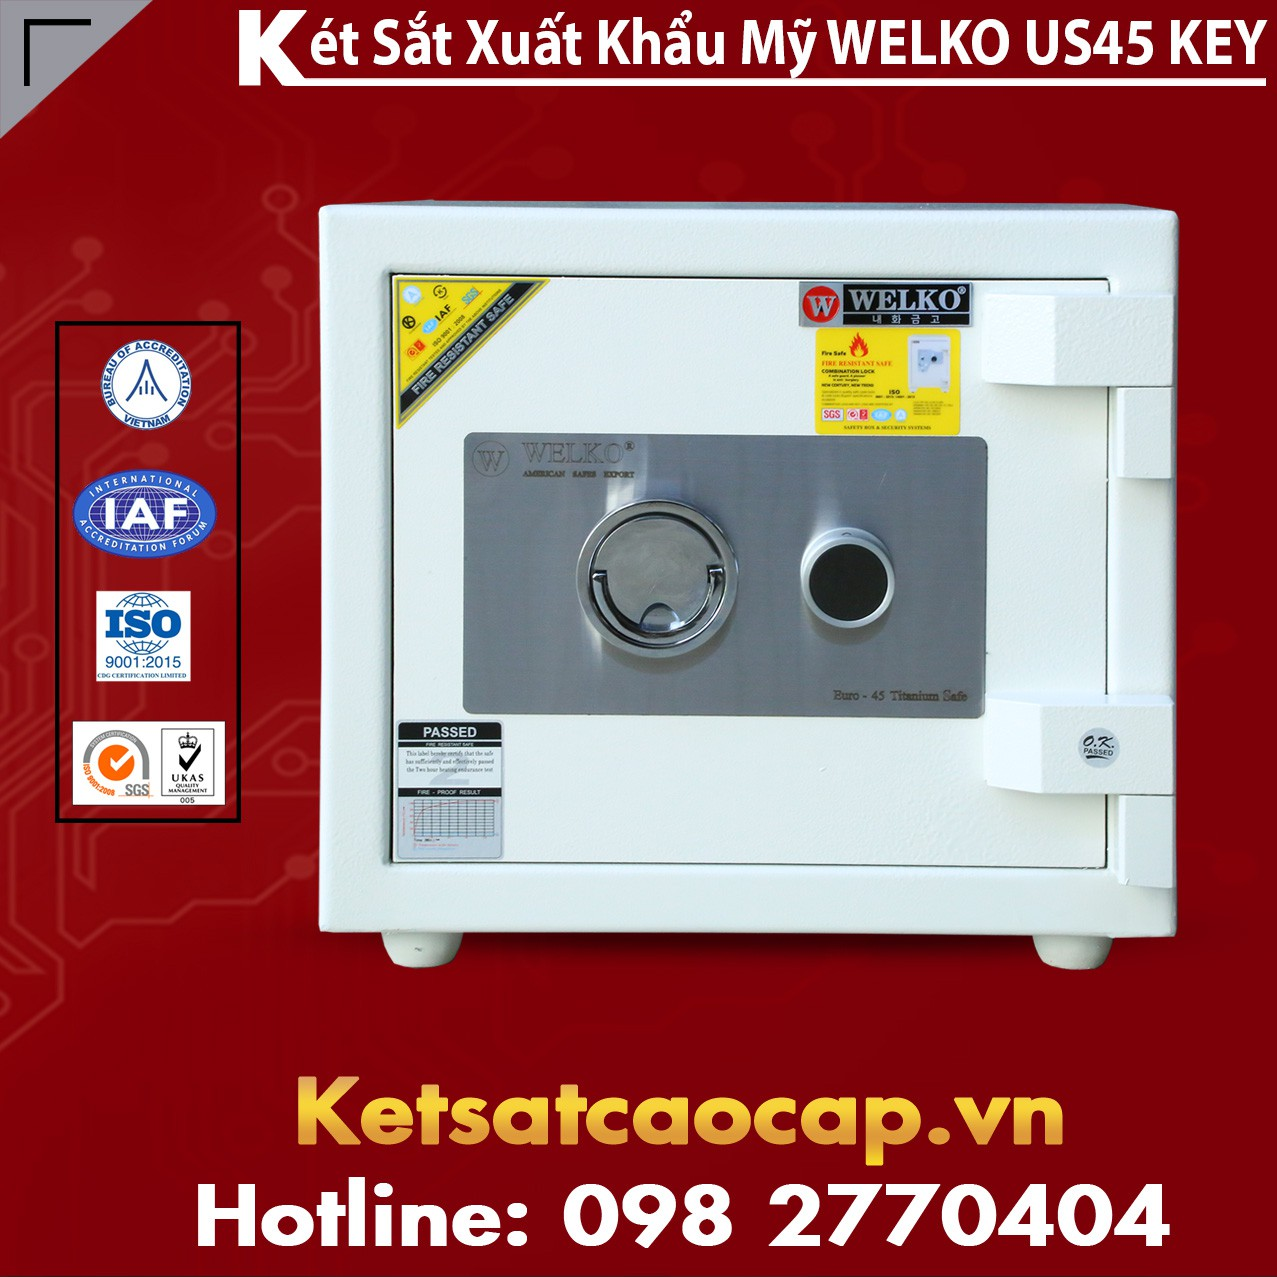 Két Sắt Mini Safes WELKO US45 KEY White